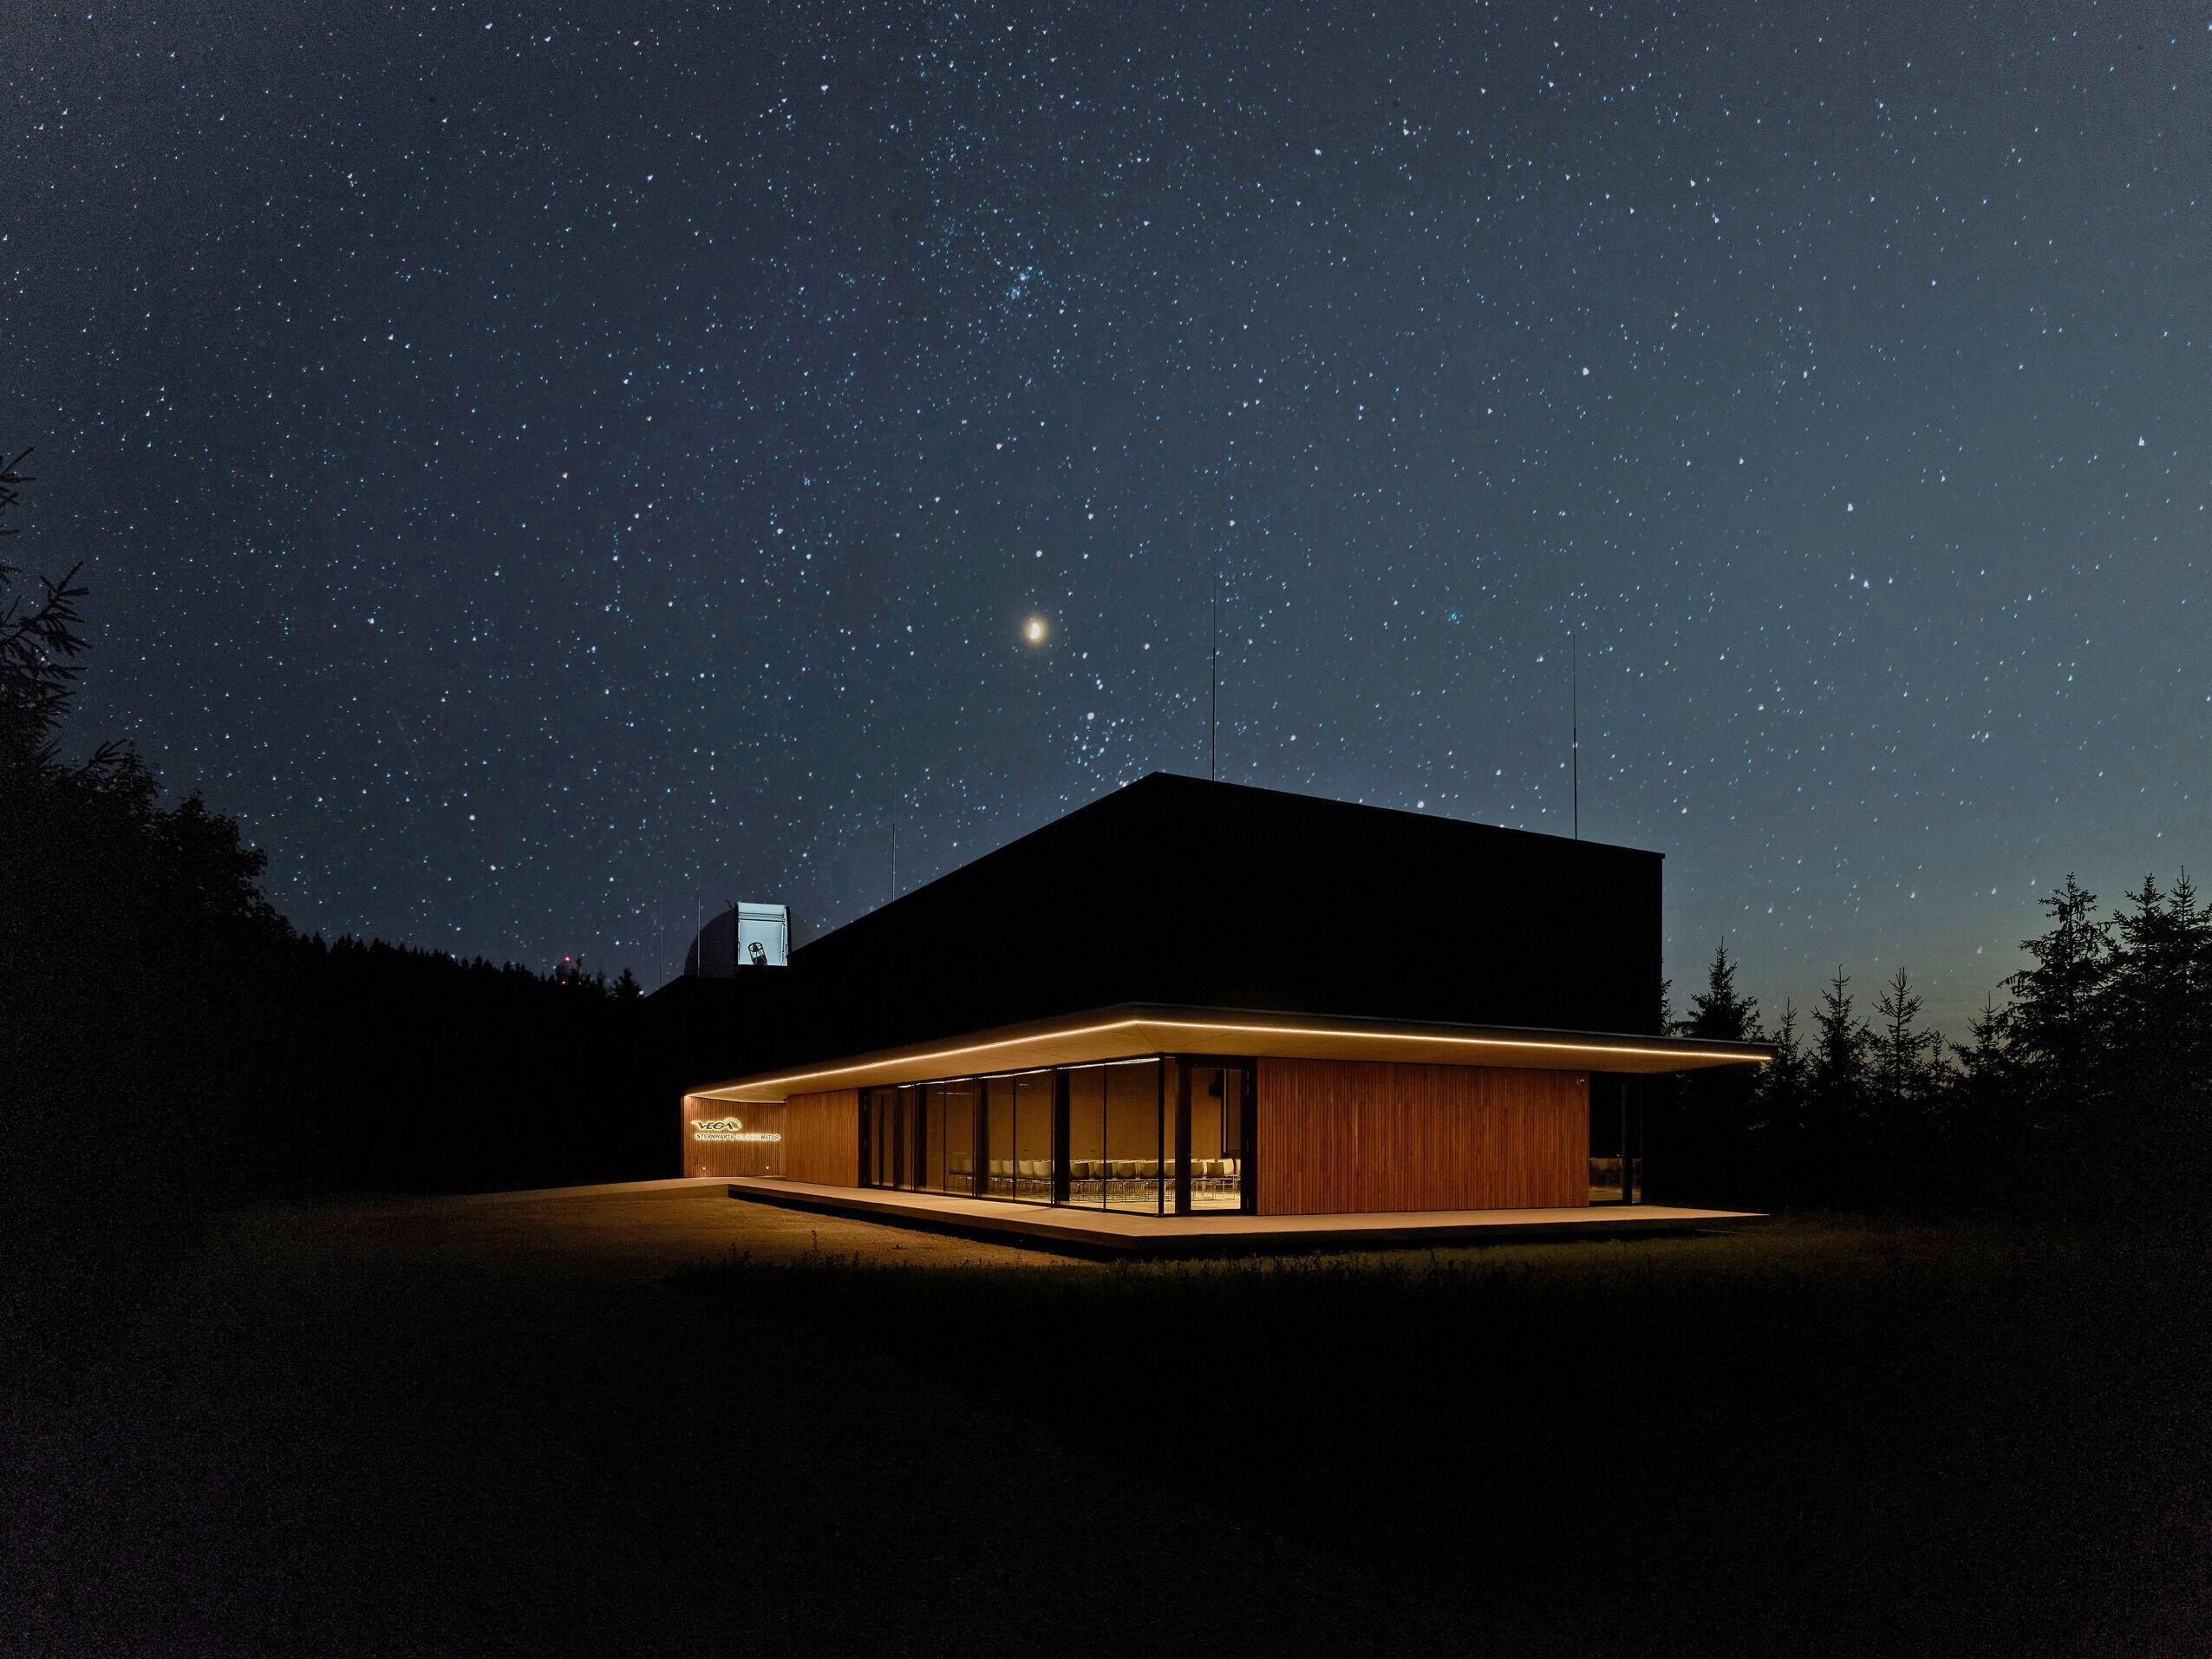 Meetings unterm Sternenhimmel Image 2